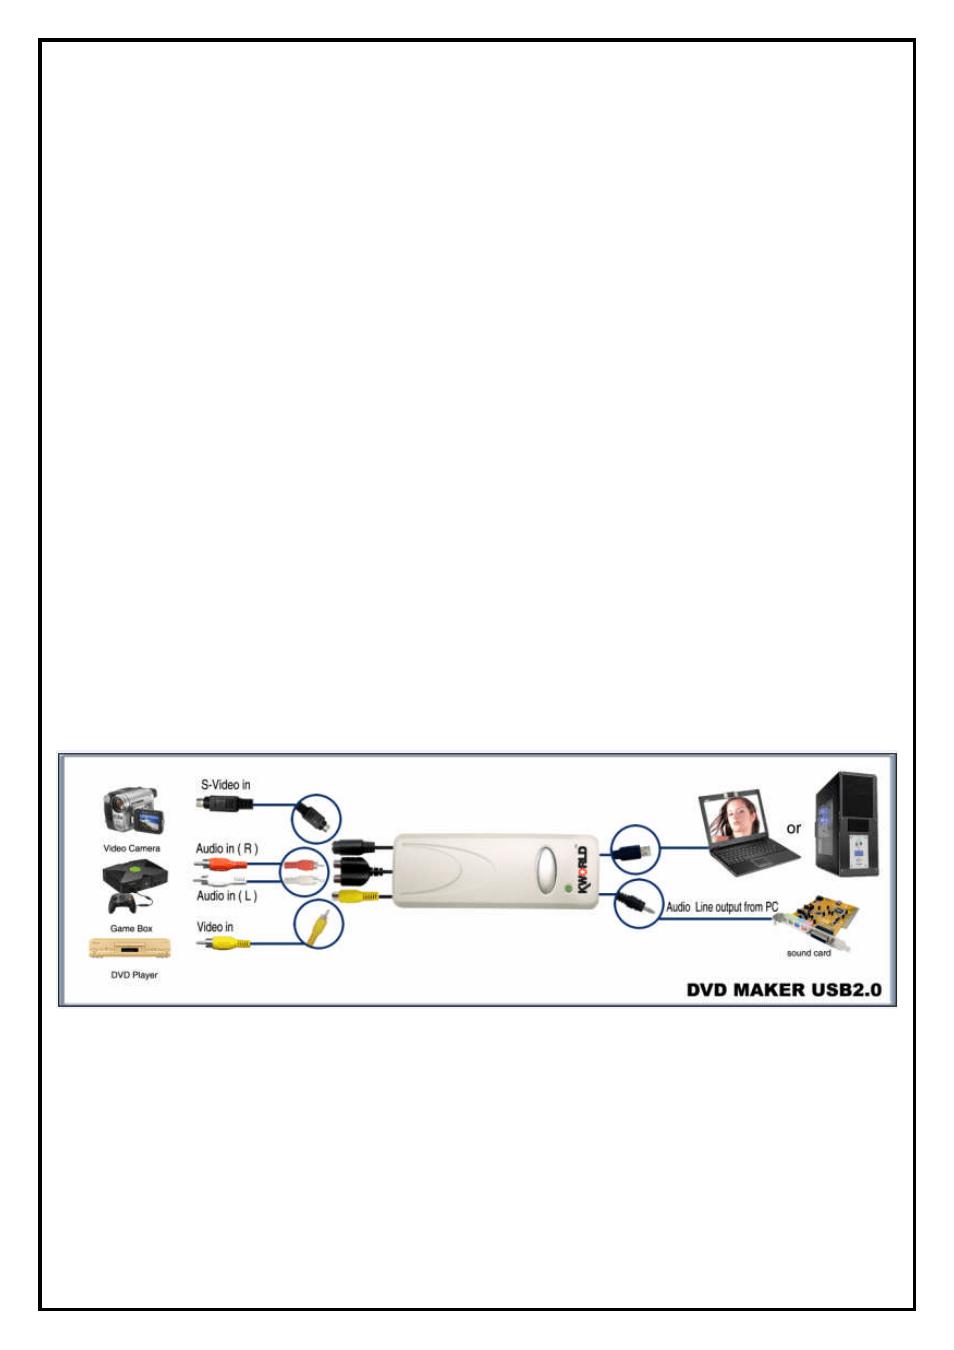 Chapter 1 : dvd maker usb2.0 hardware installation, 1